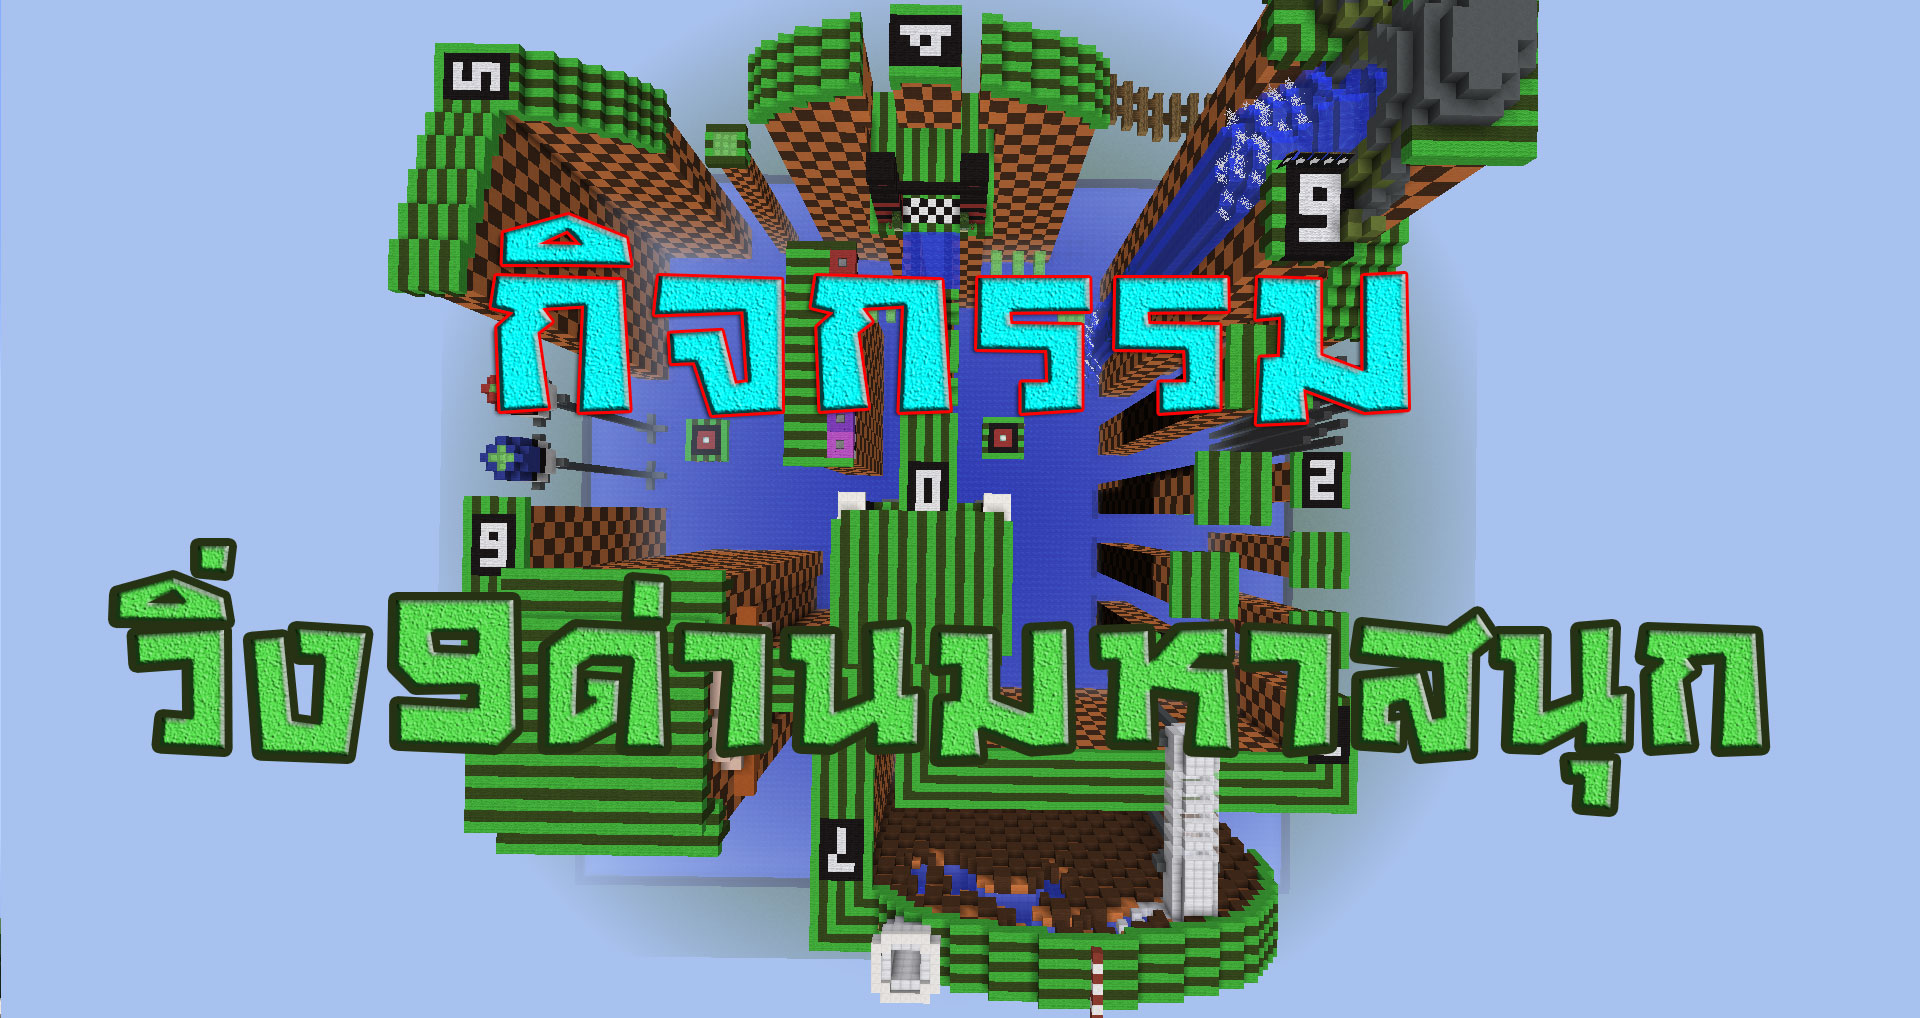 [Minecraft] กิจกรรม วิ่ง9ด่านมหาสนุก Run 9 Fun เซิฟ SayOuiMinecraft